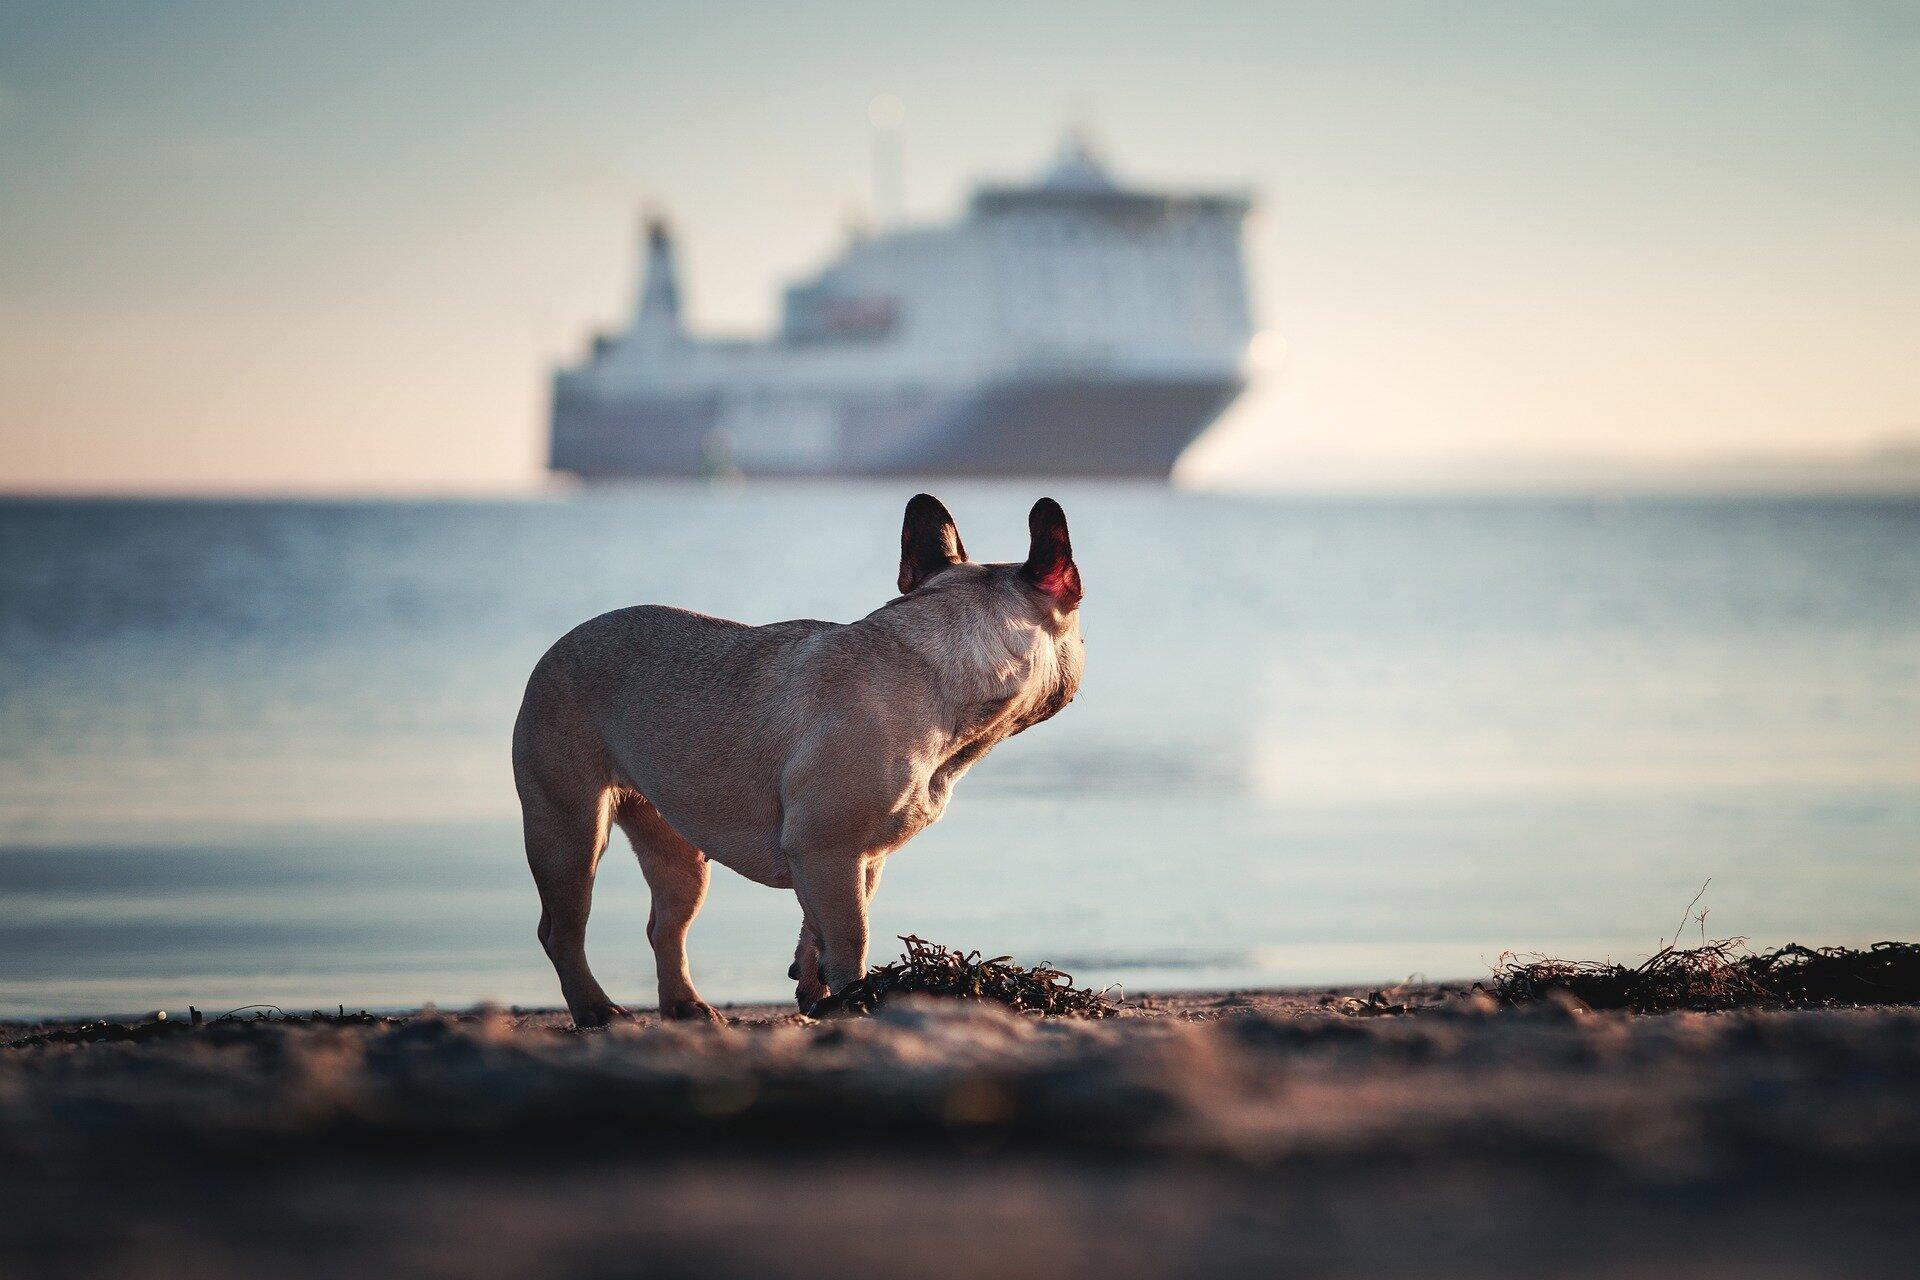 Colorlinehund